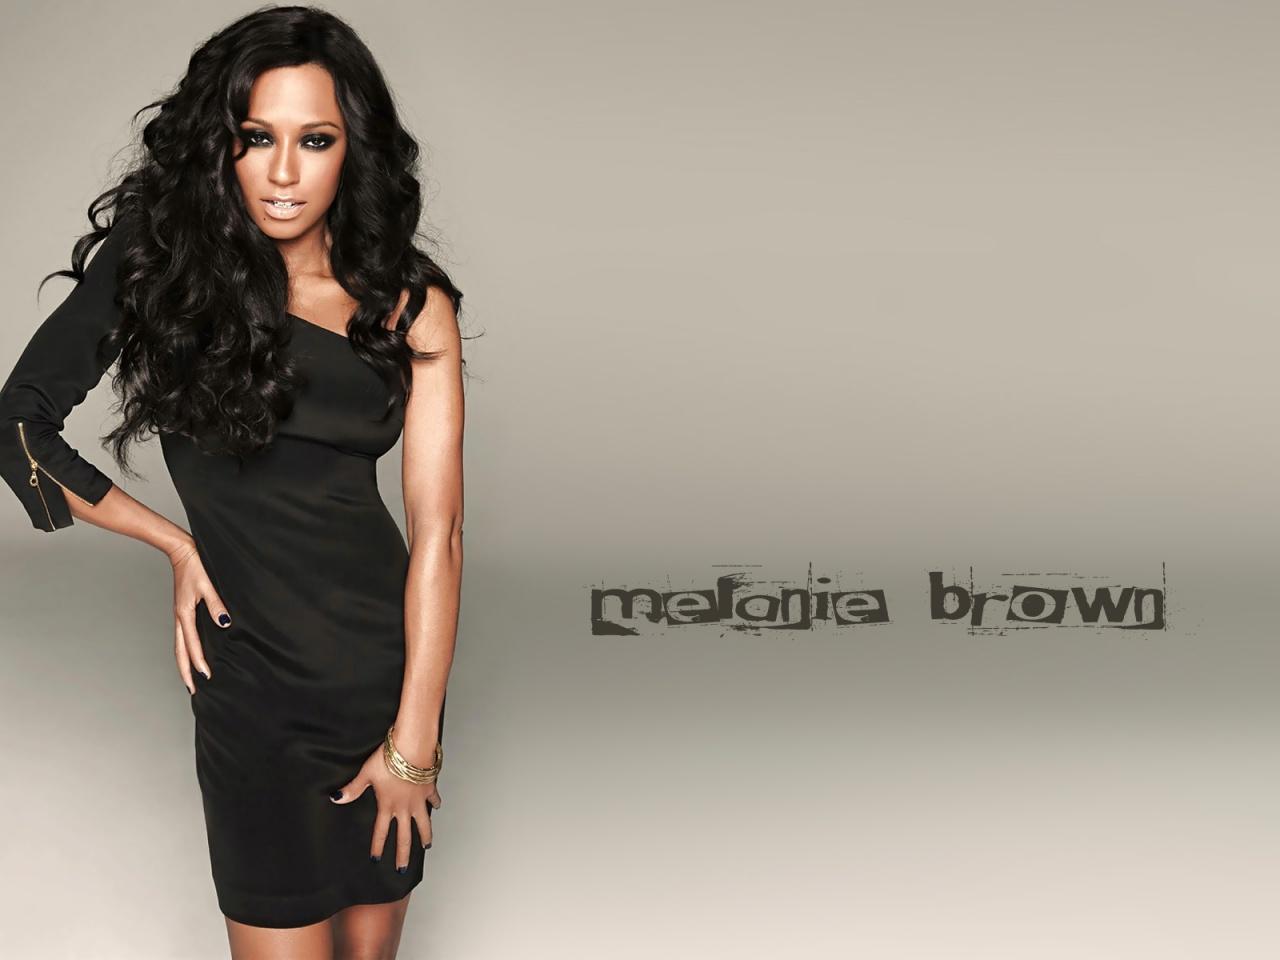 http://2.bp.blogspot.com/-ZvwmTXLrNNM/TzBB70sgLfI/AAAAAAAABTM/UI4fr1aK3Uo/s1600/melanie_brown_12523_mel_b39_122_707lo-1280x960.jpg